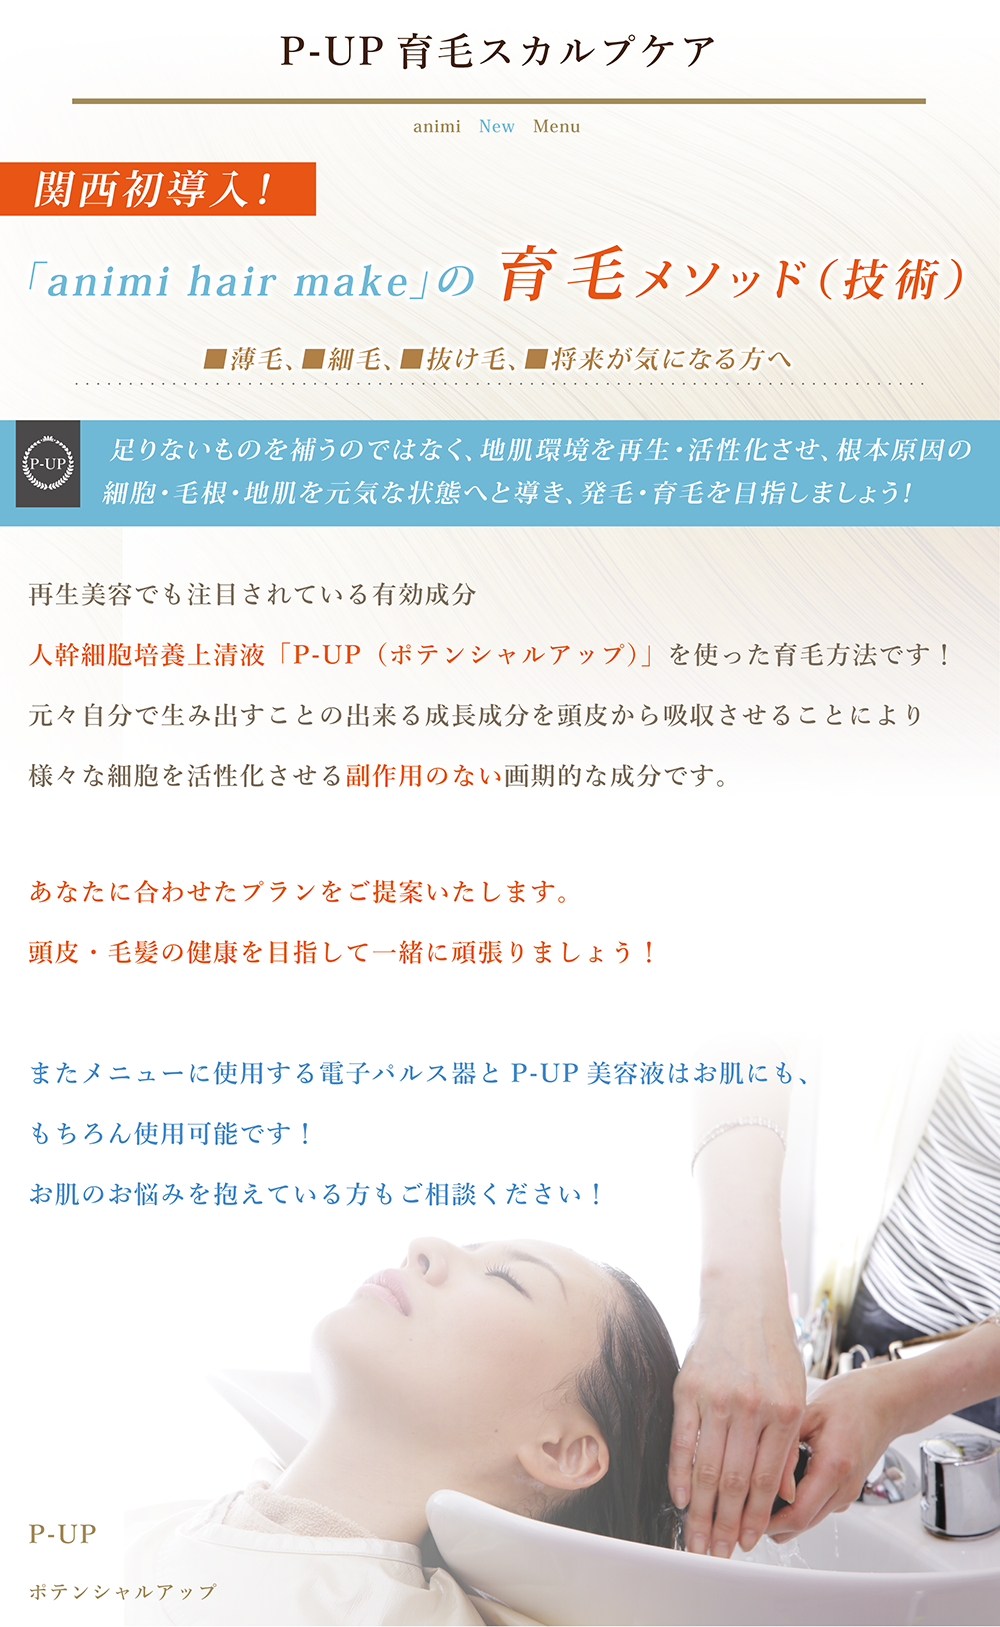 P-UP育毛 トップイメージ